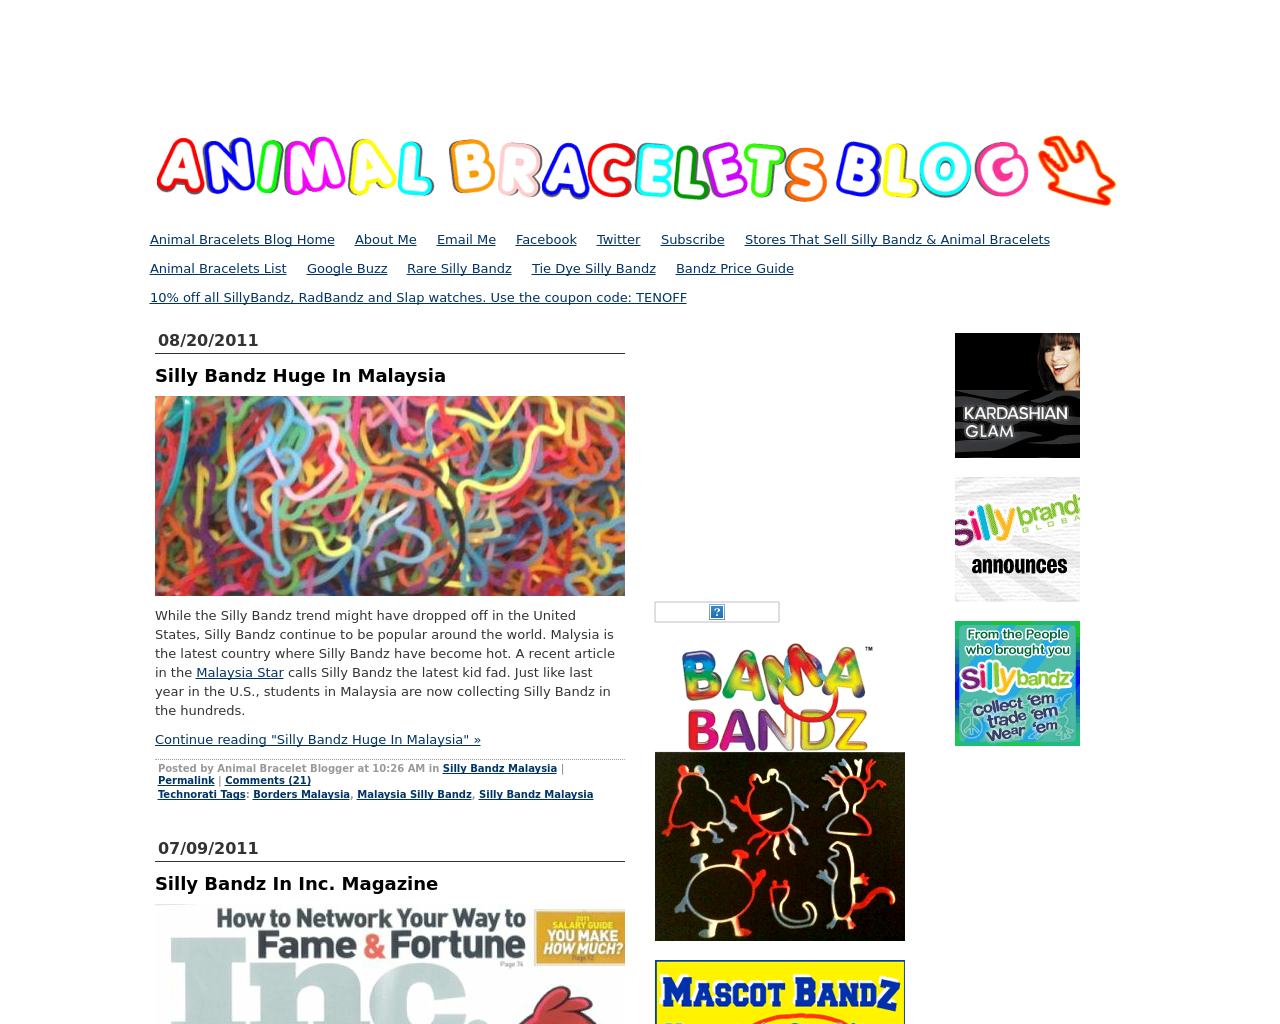 Animal-Bracelets-Blog-Advertising-Reviews-Pricing